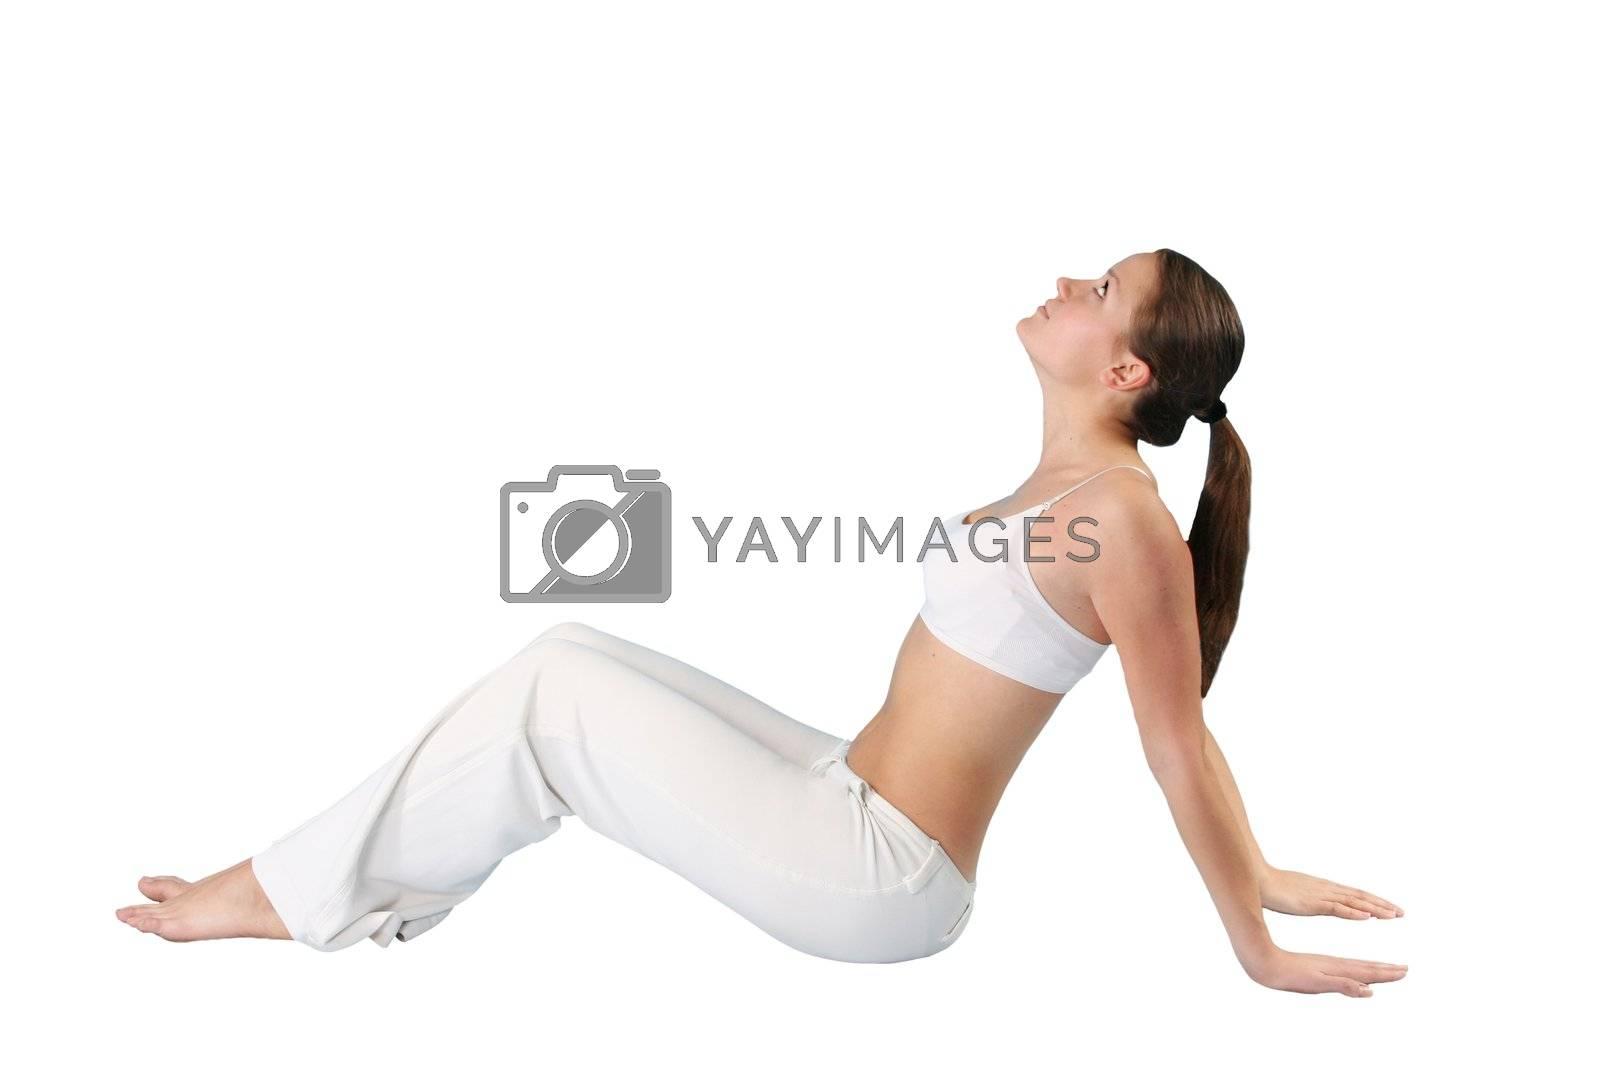 lifestyles females beautiful exercising portraits pilates beauty